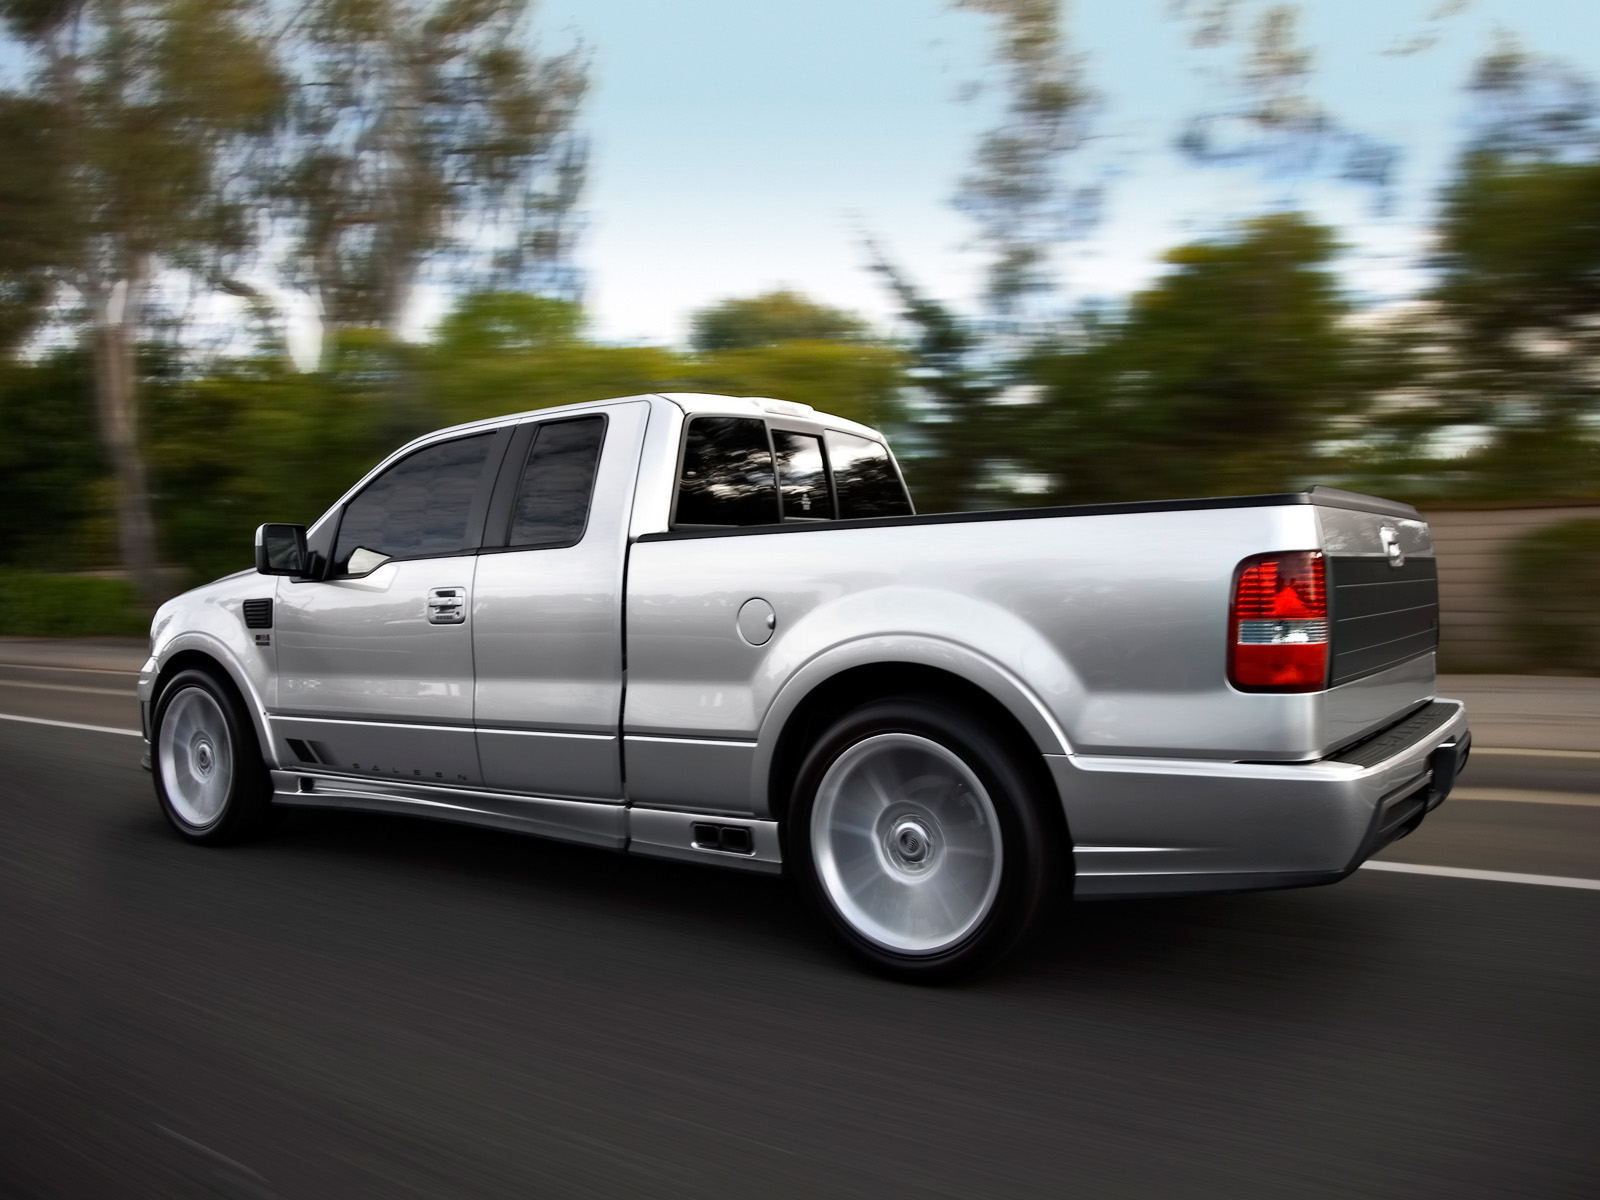 2007 saleen s331 sport truck ford f 150 pickup muscle supertruck wallpaper 1600x1200 113981. Black Bedroom Furniture Sets. Home Design Ideas